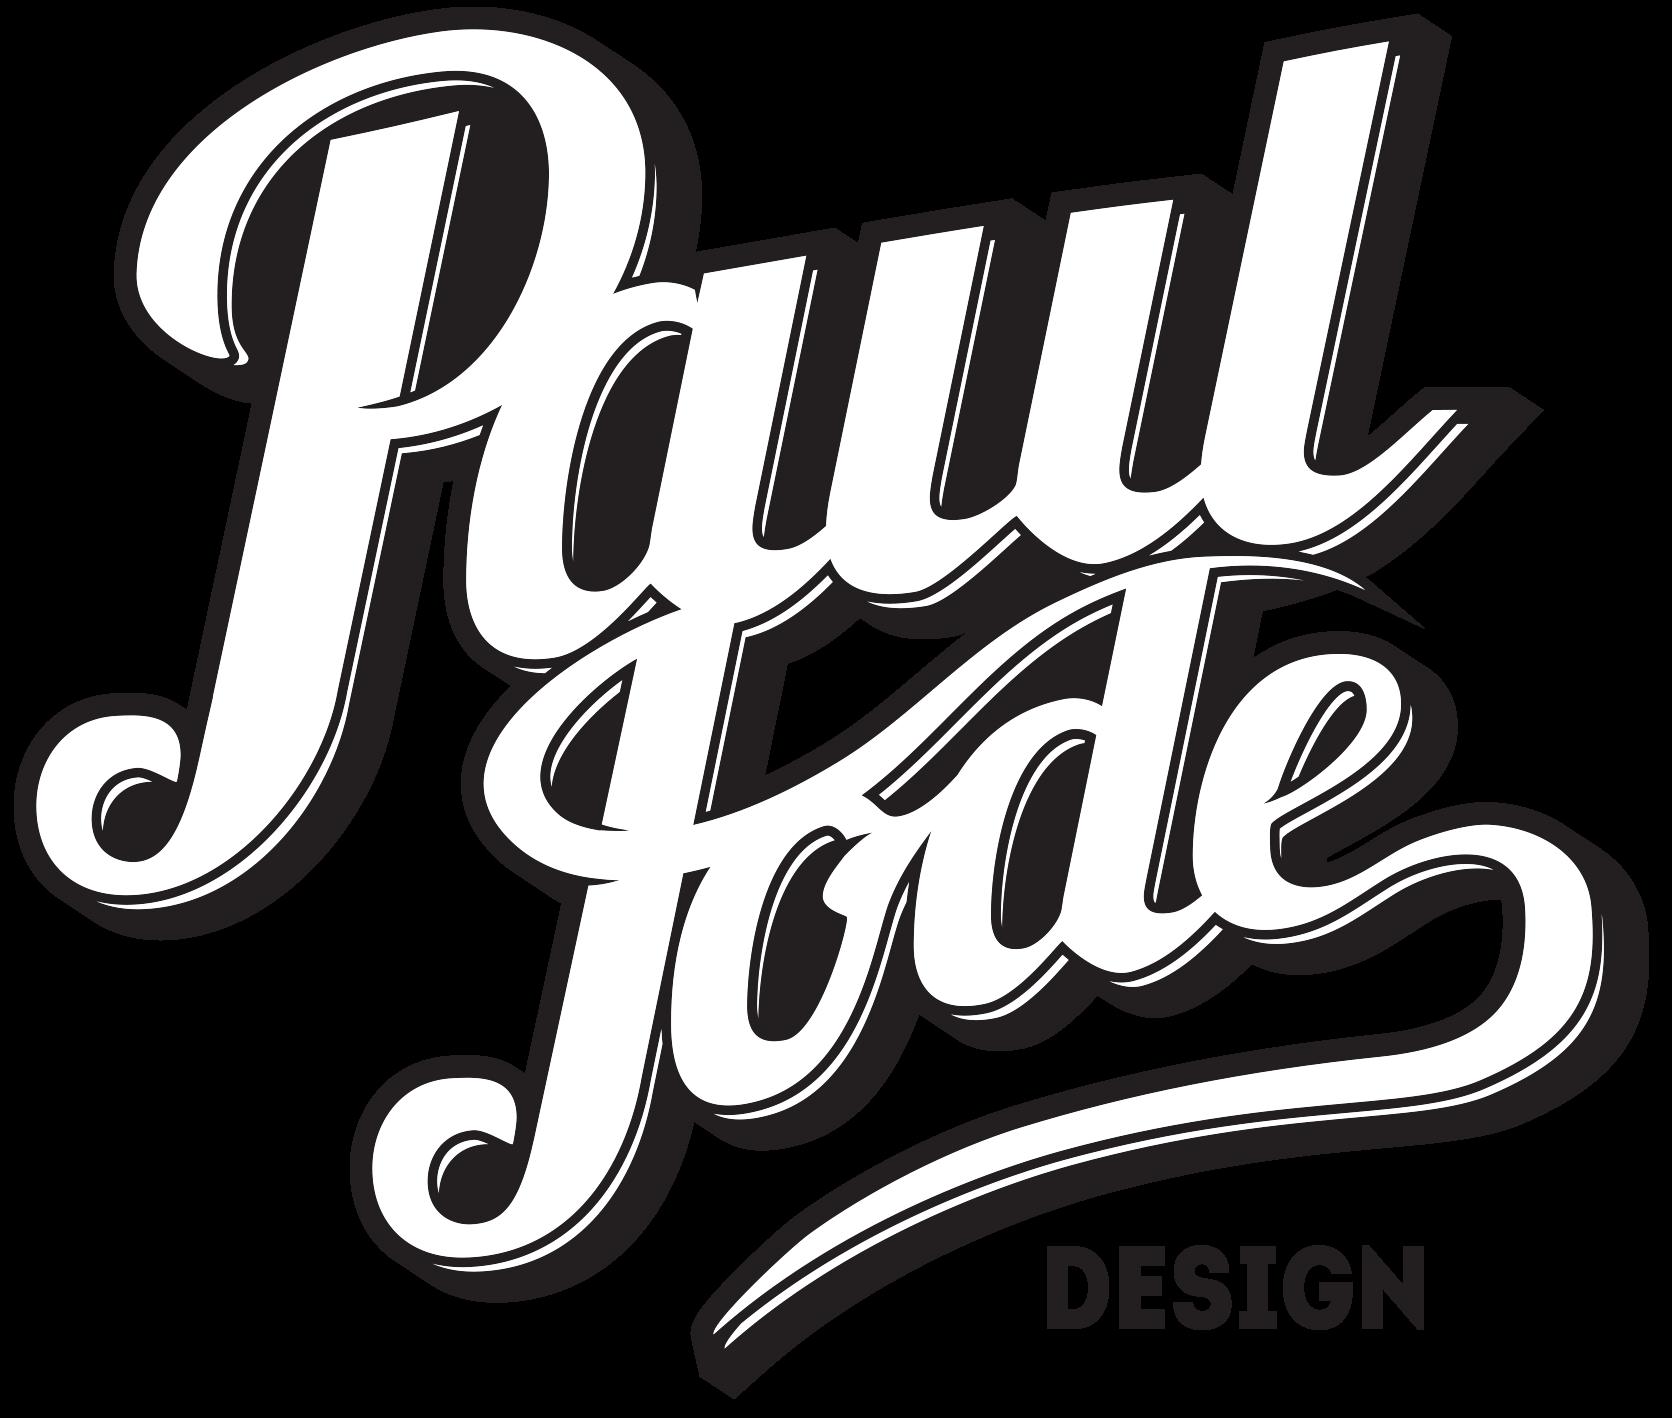 Paul Jode Design